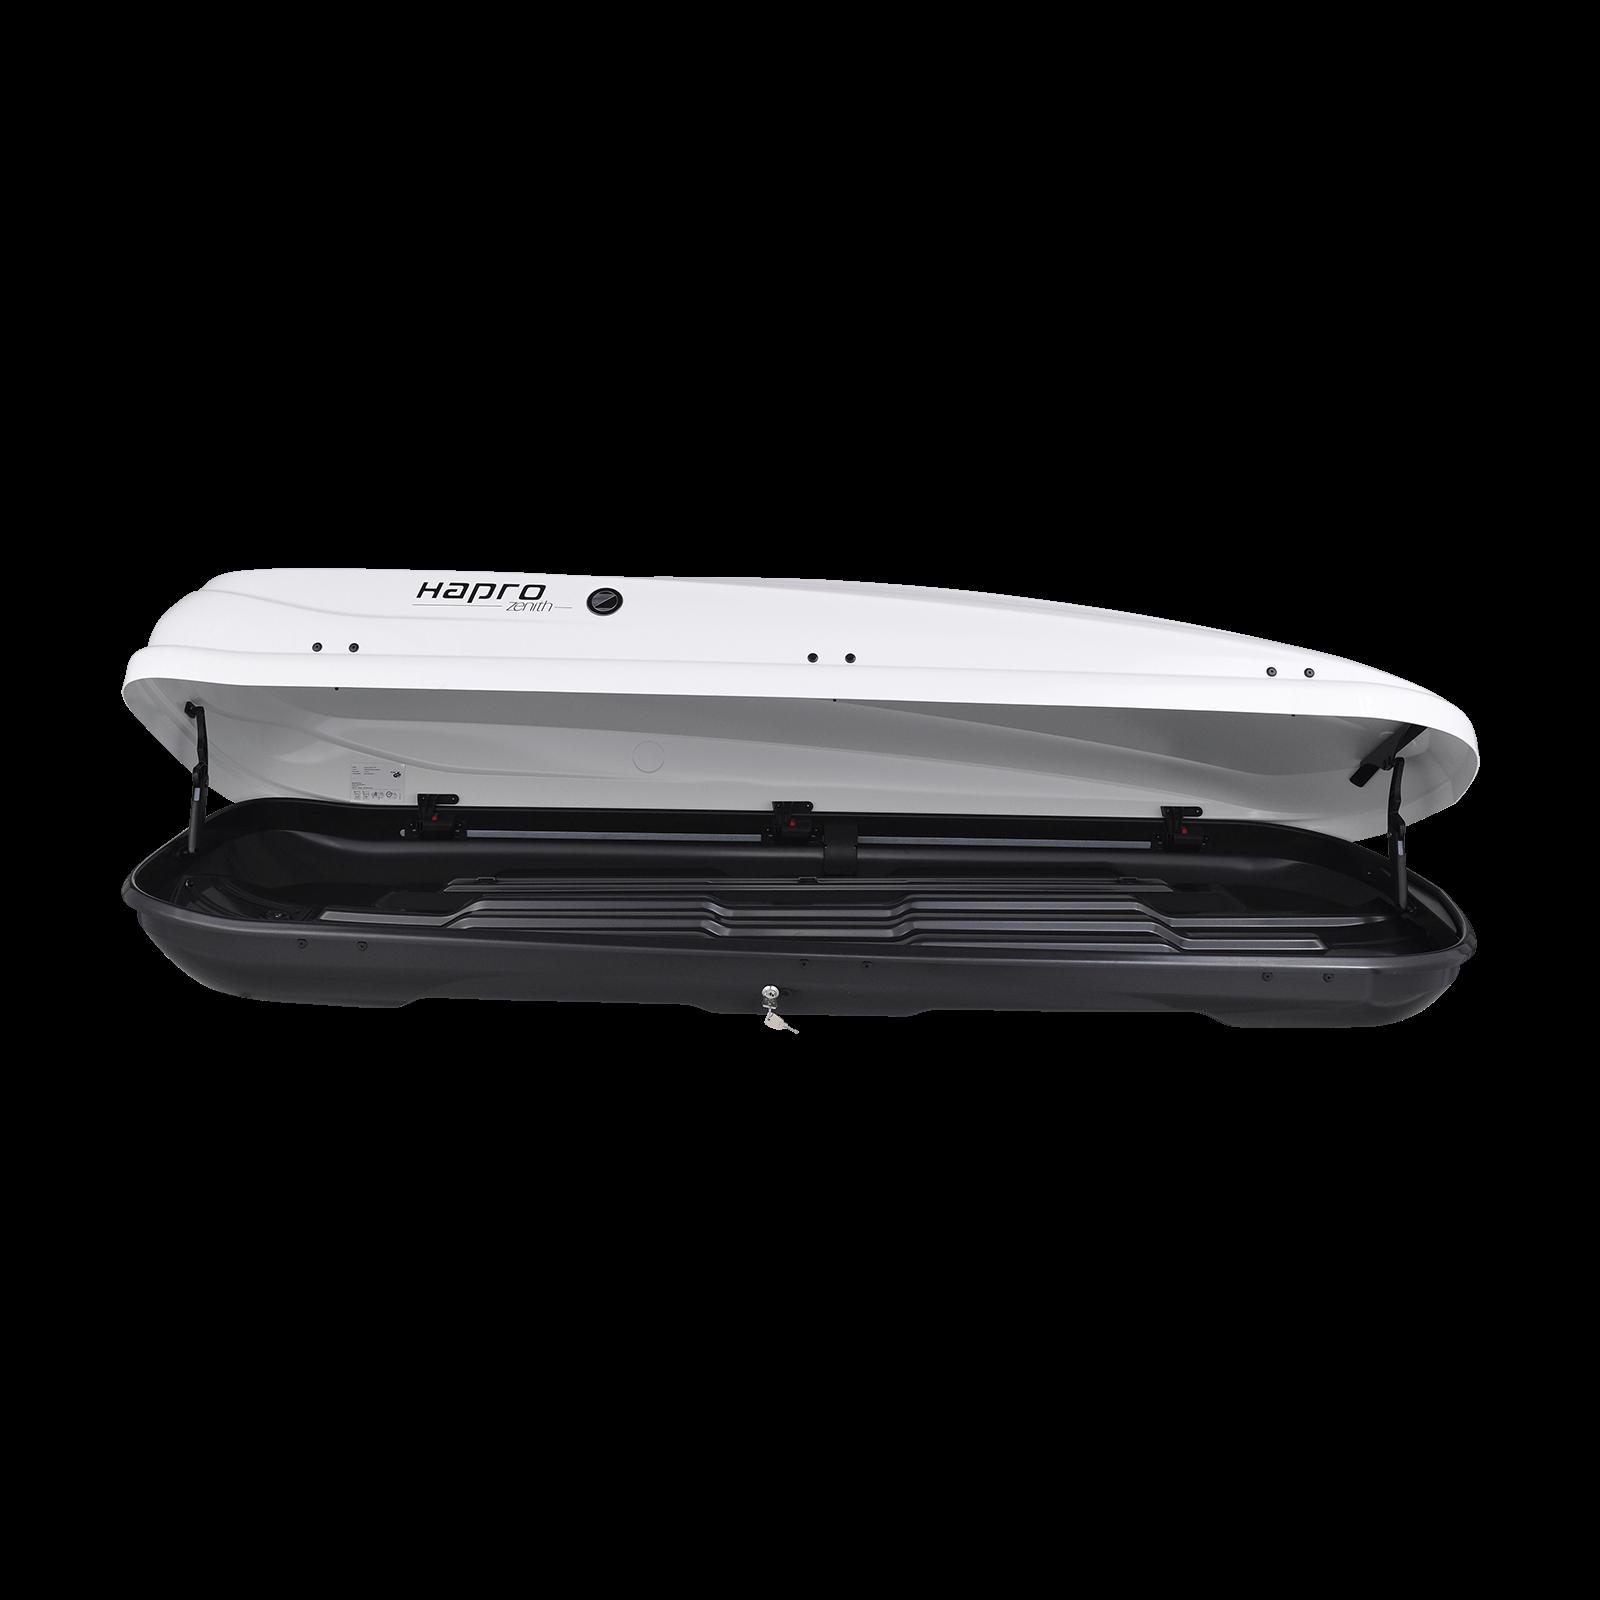 Dachbox Hapro Zenith 8.6 PureWhite - Bild 2